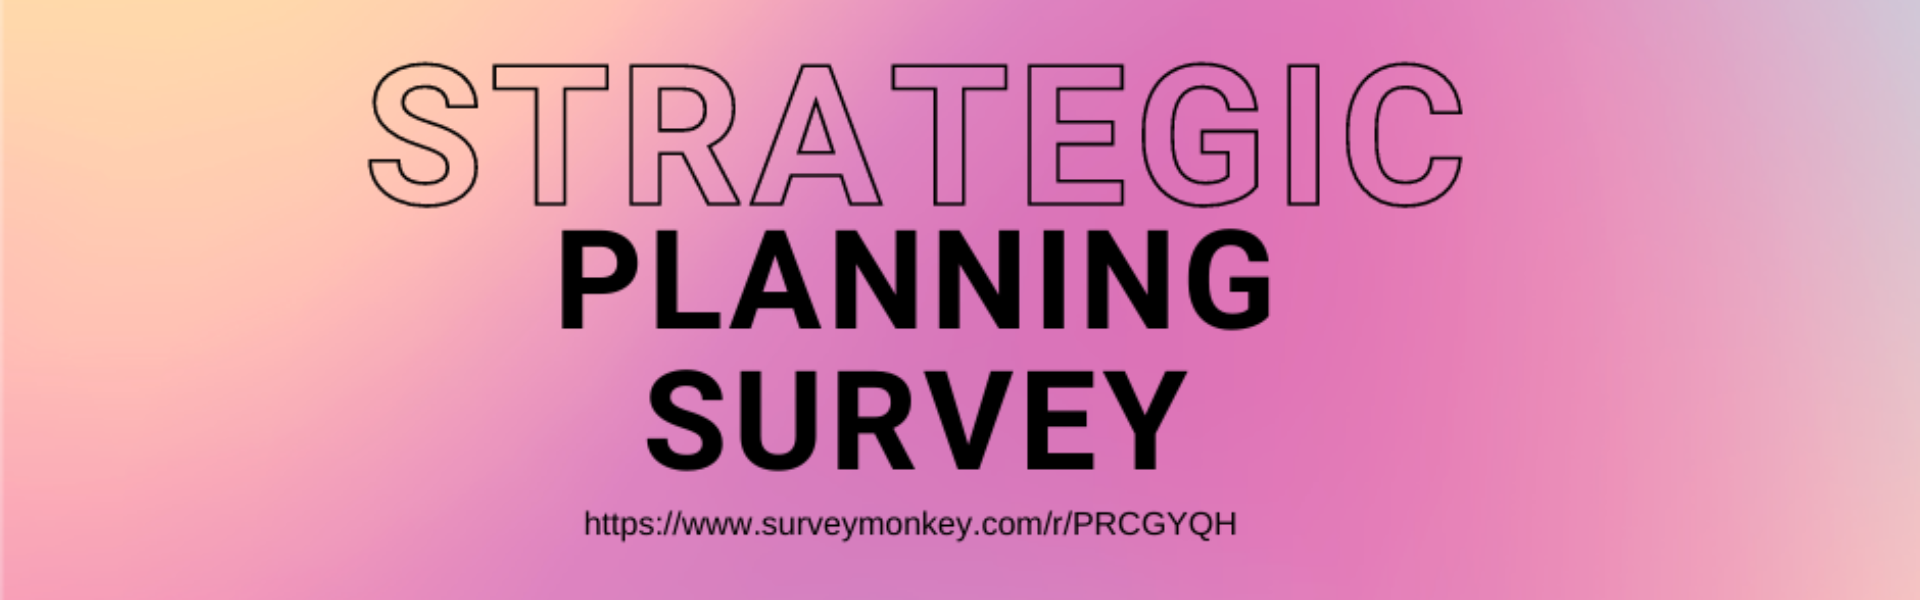 Facebook- Copy of Strategic plan survey poster! (4)